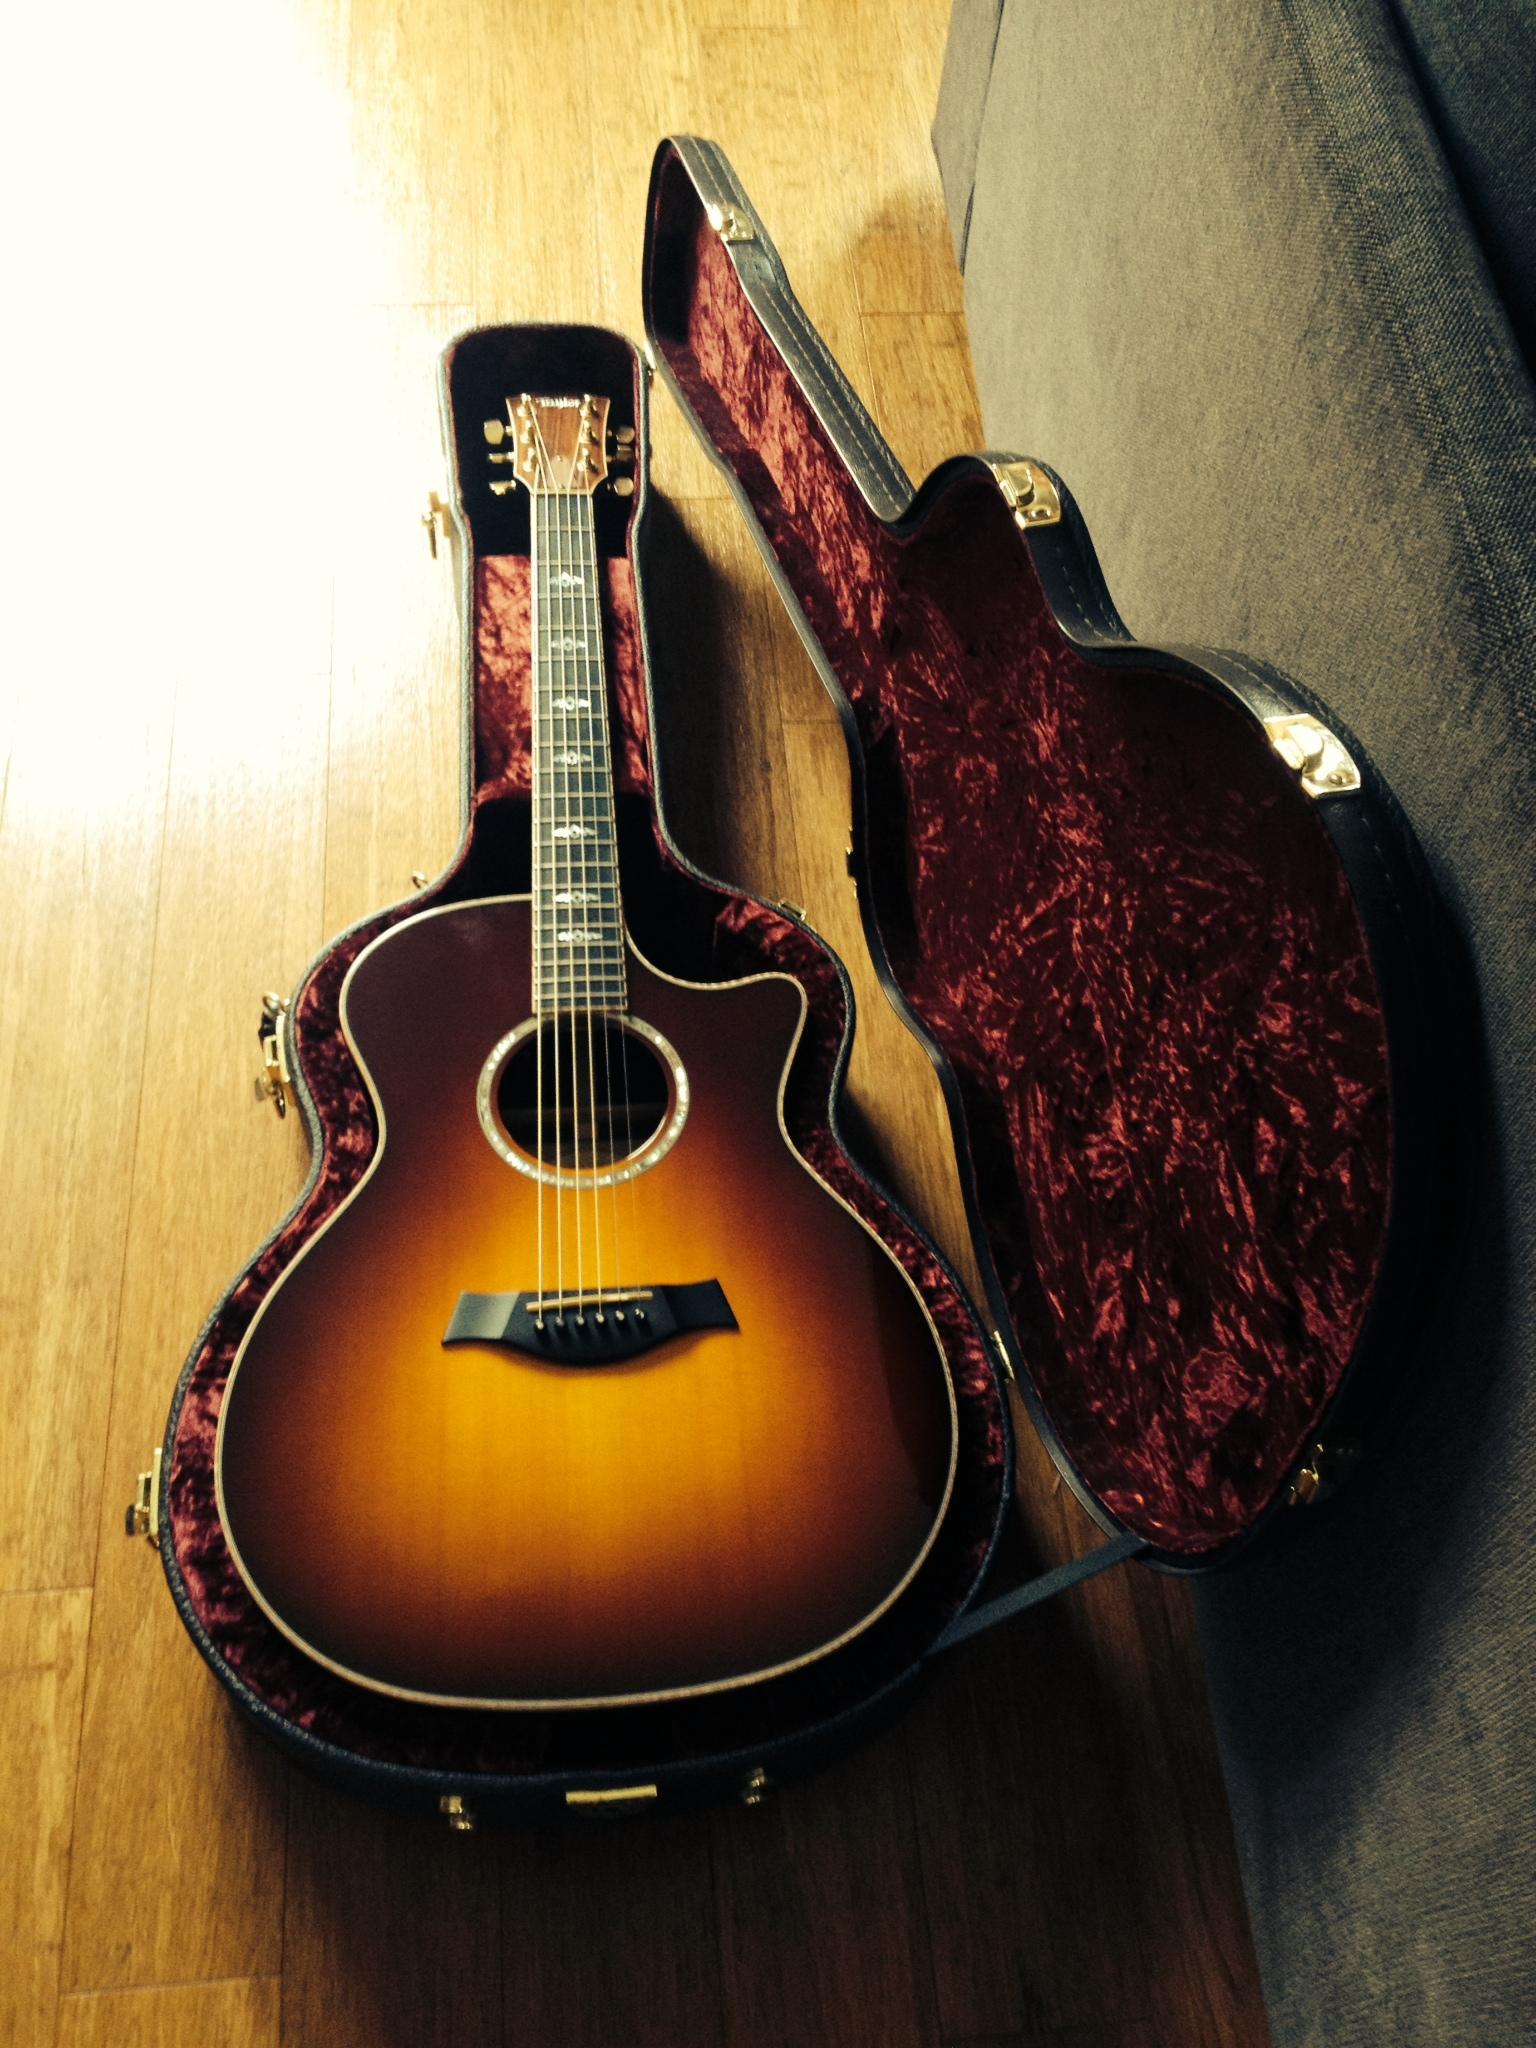 guitare elec acous taylor 814ce tobacco sunburst lille 59000. Black Bedroom Furniture Sets. Home Design Ideas